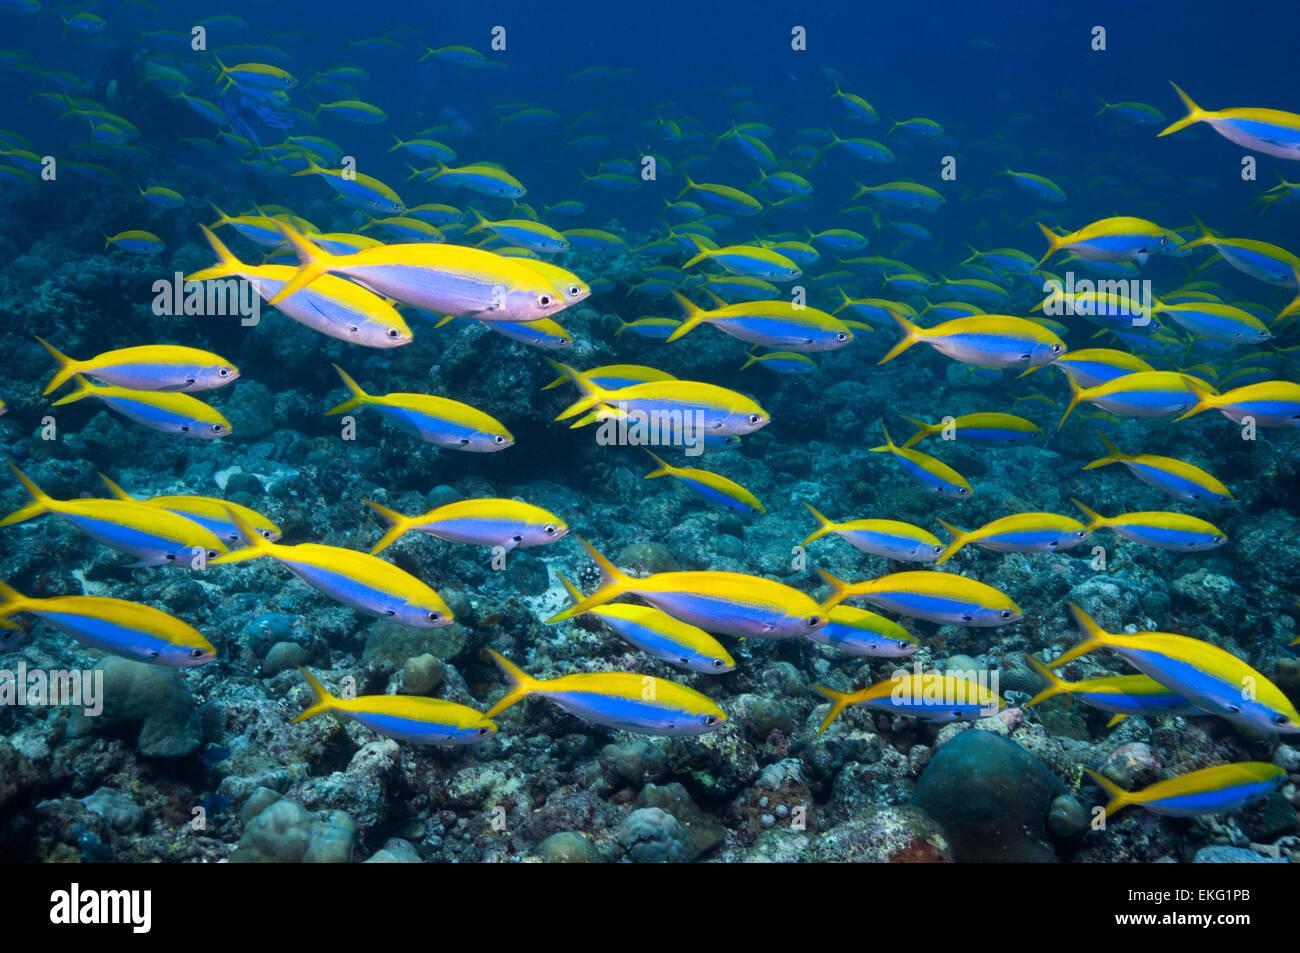 Yellowback fusilier [Caesio xanthonota] school over coral reef.  Maldives. Stock Photo